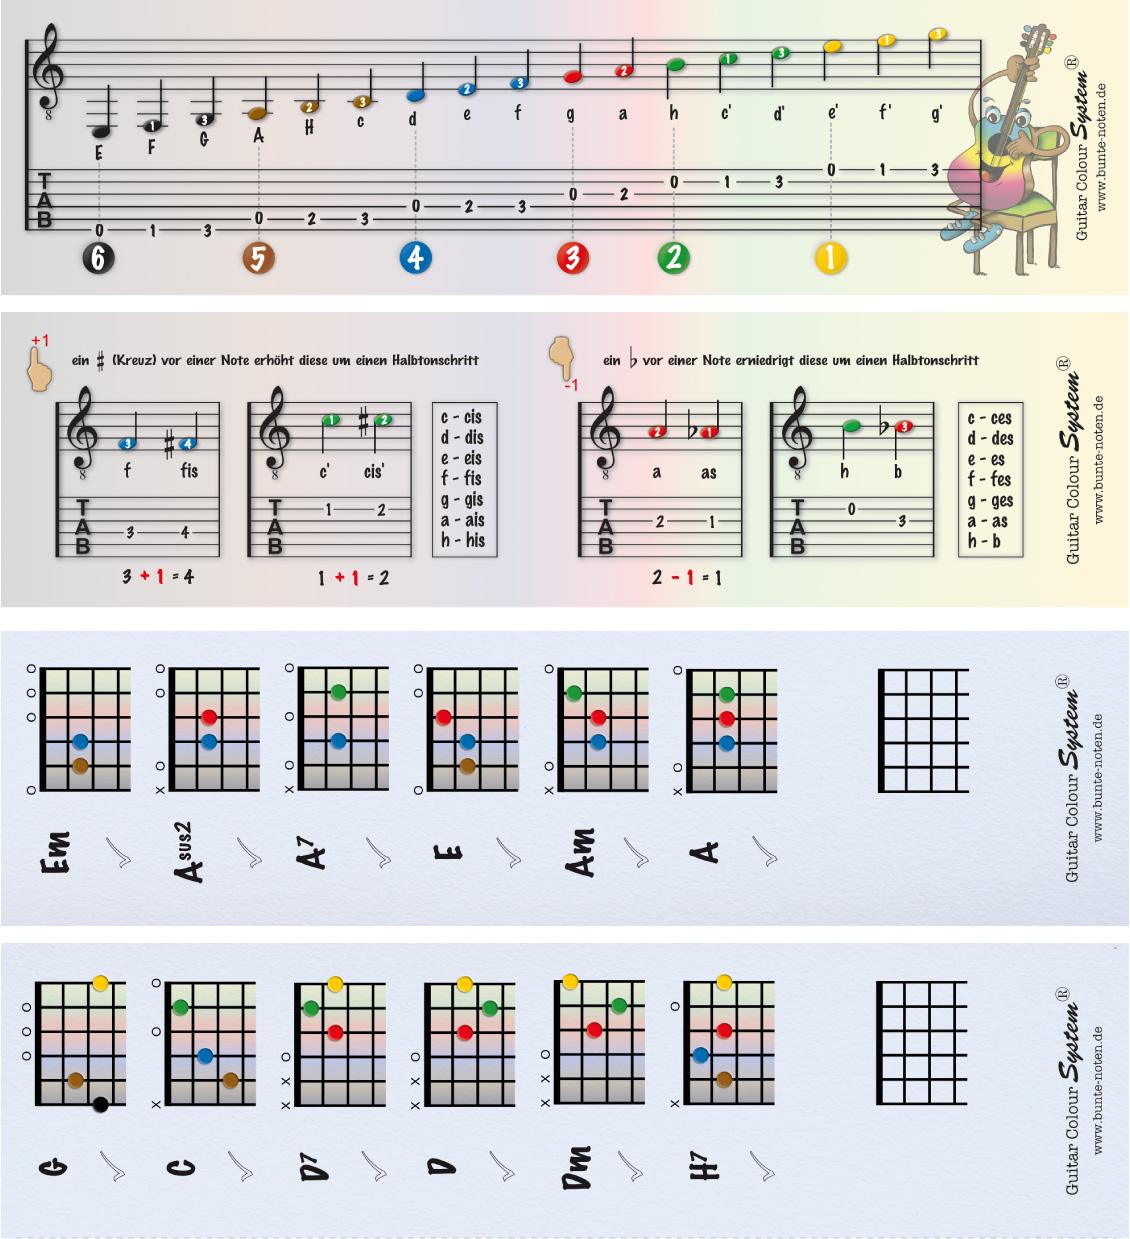 News 2018 | Gitarre lernen nach farbigen Noten